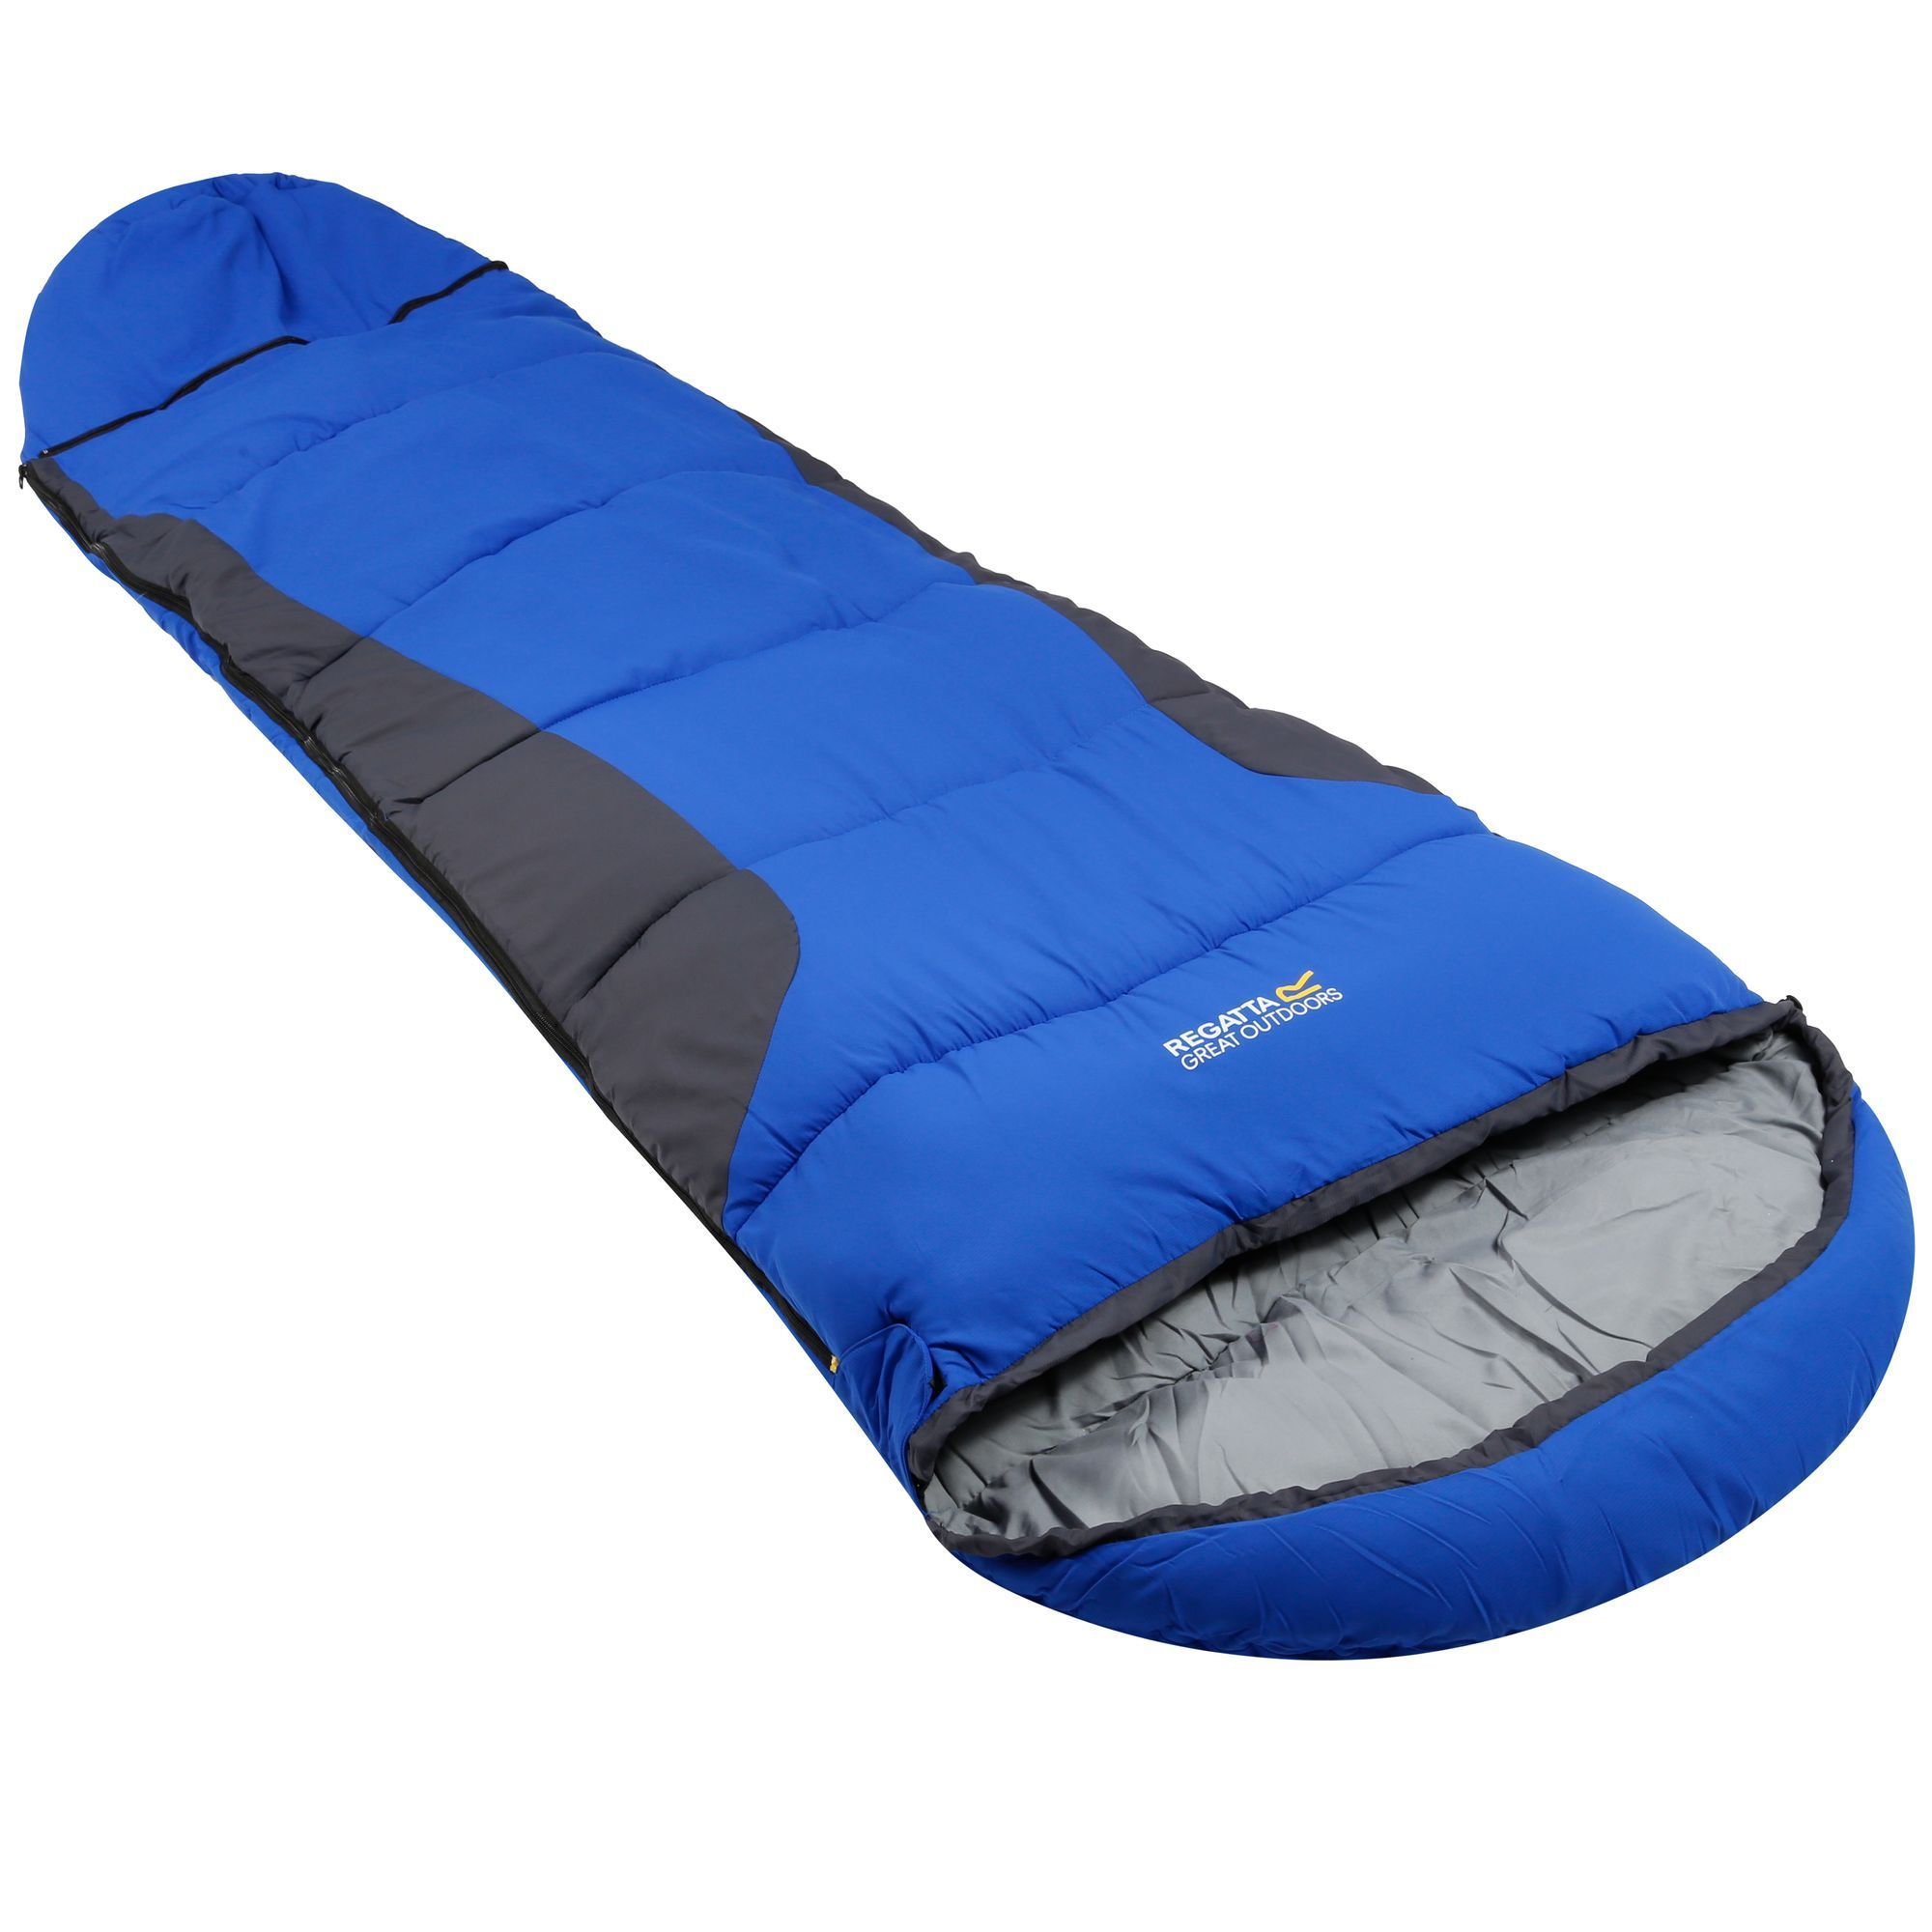 Regatta Hilo Boost Expandable Sleeping Bag